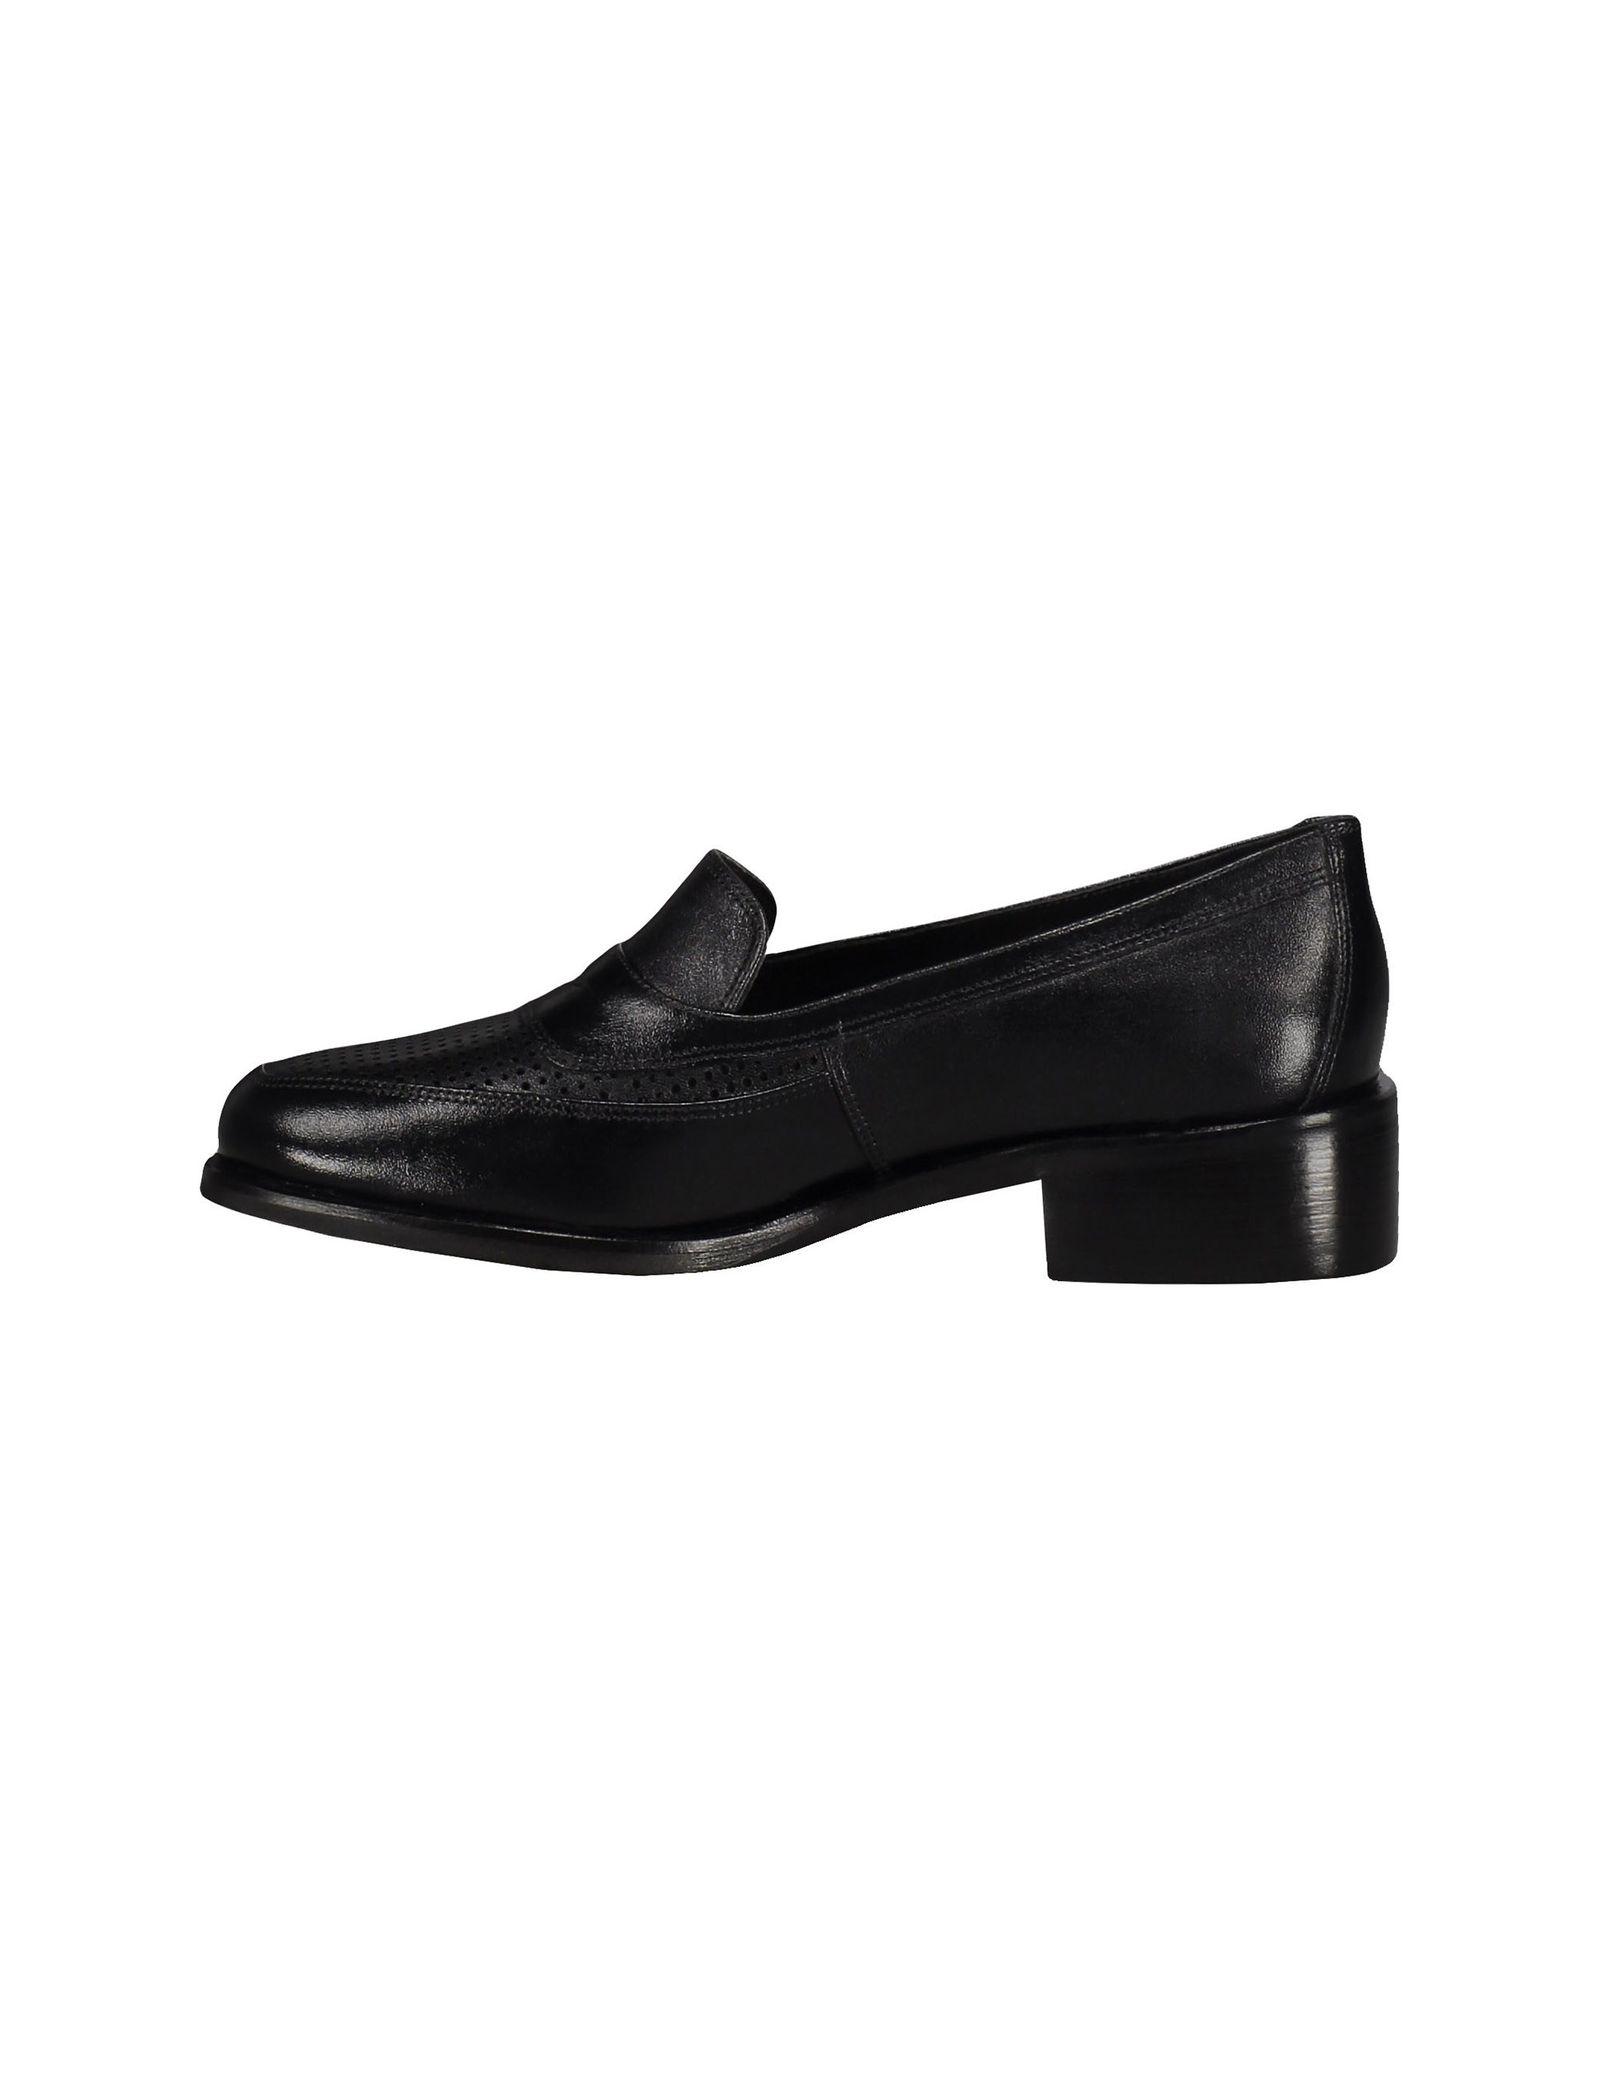 کفش چرم تخت زنانه - شهر چرم - مشکي - 3